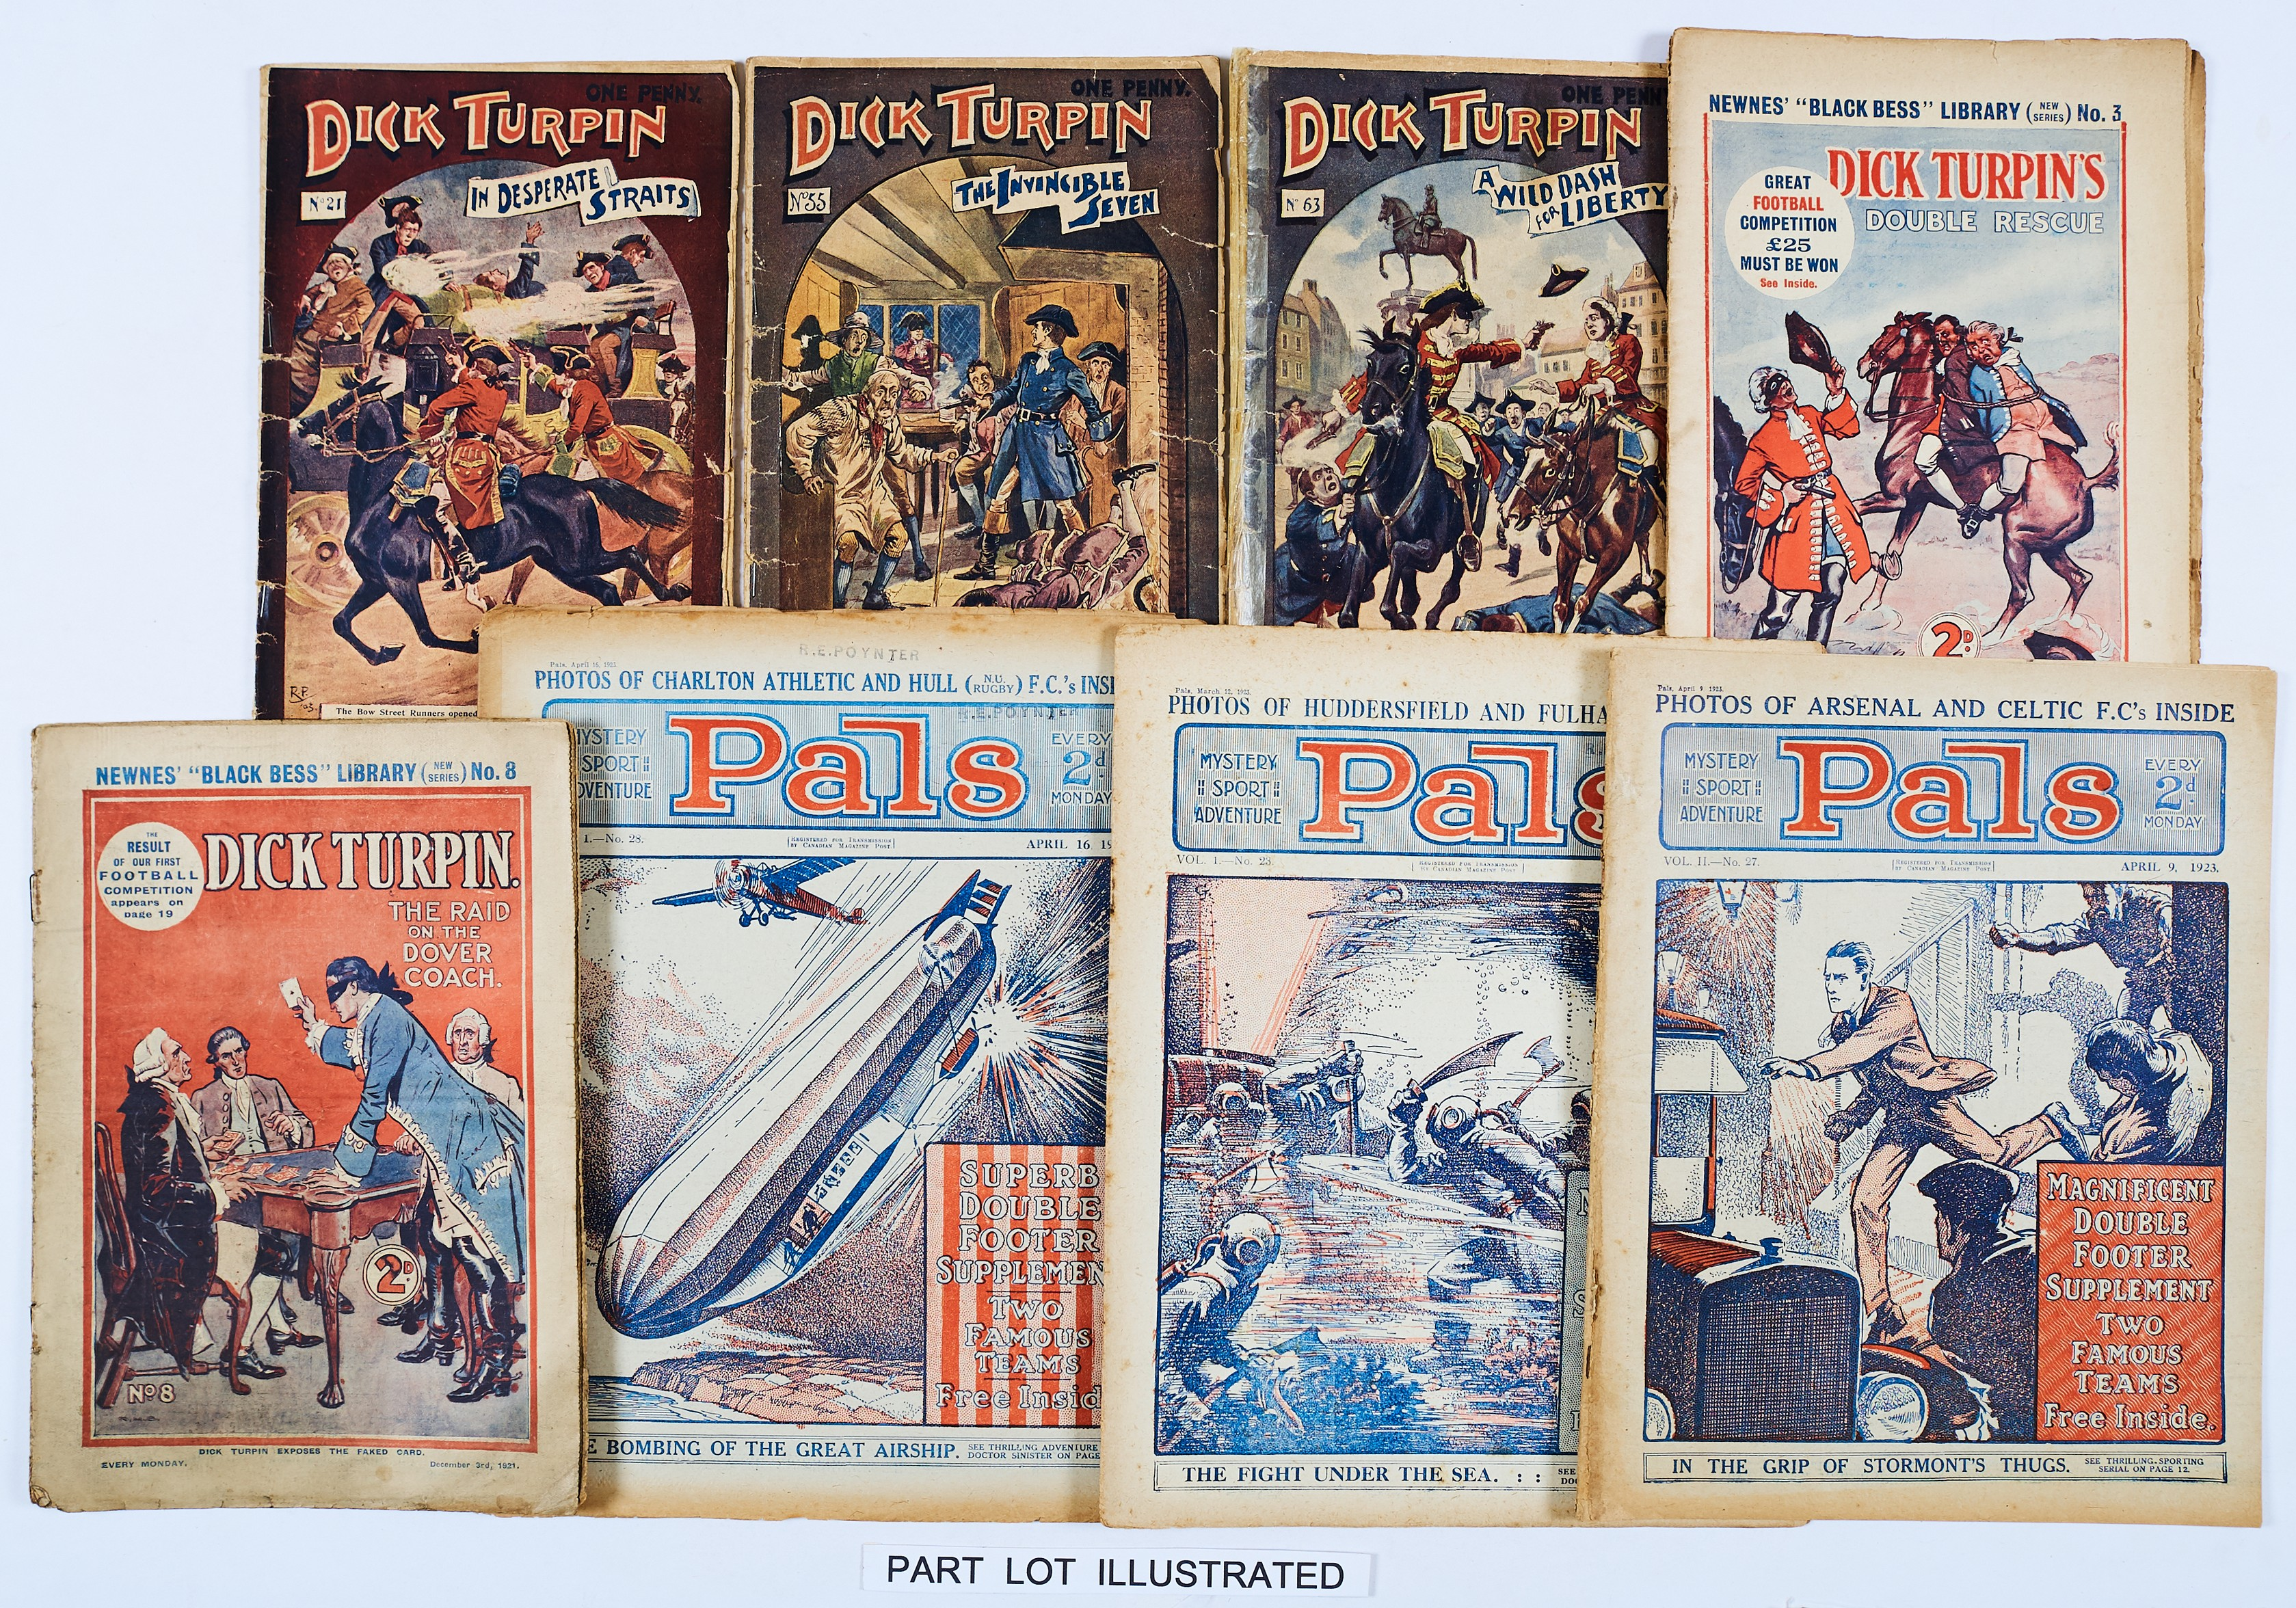 Lot 4 - Dick Turpin (1903-03 Aldine): 21, 55, 63 (1921-22 Newnes): 3, 5 (x2), 8, 9, 12, 23, 25, 29, 30,